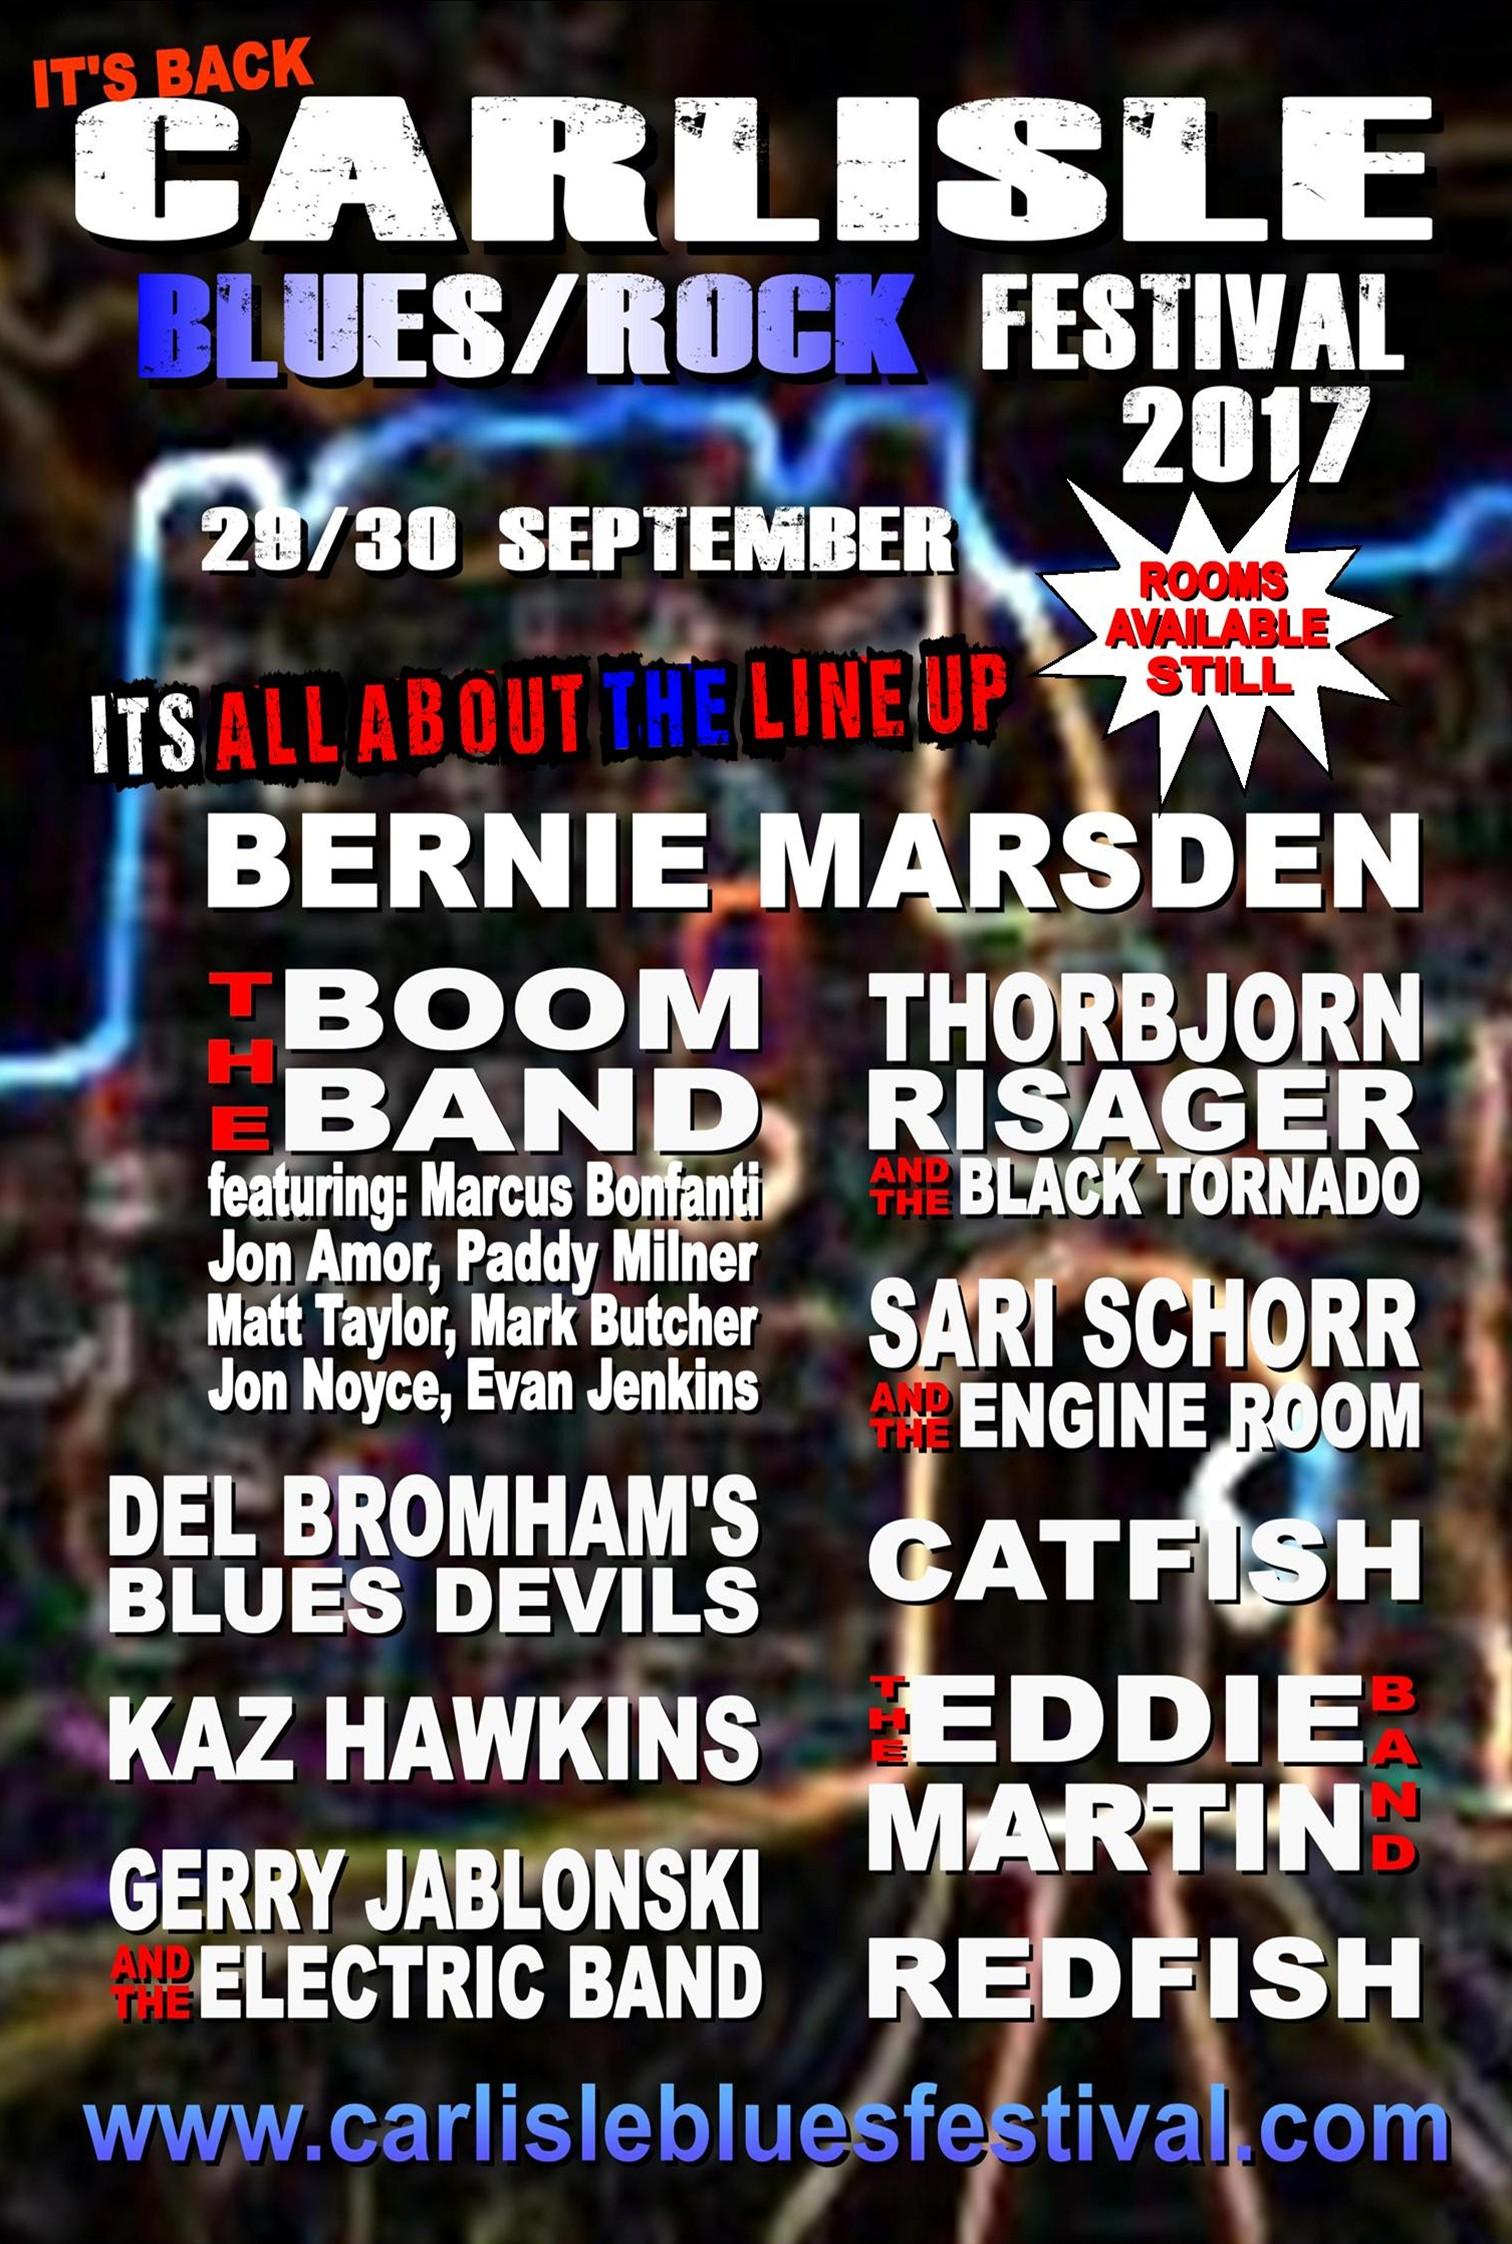 Carlisle Blues/Rock Festival 2017 poster image